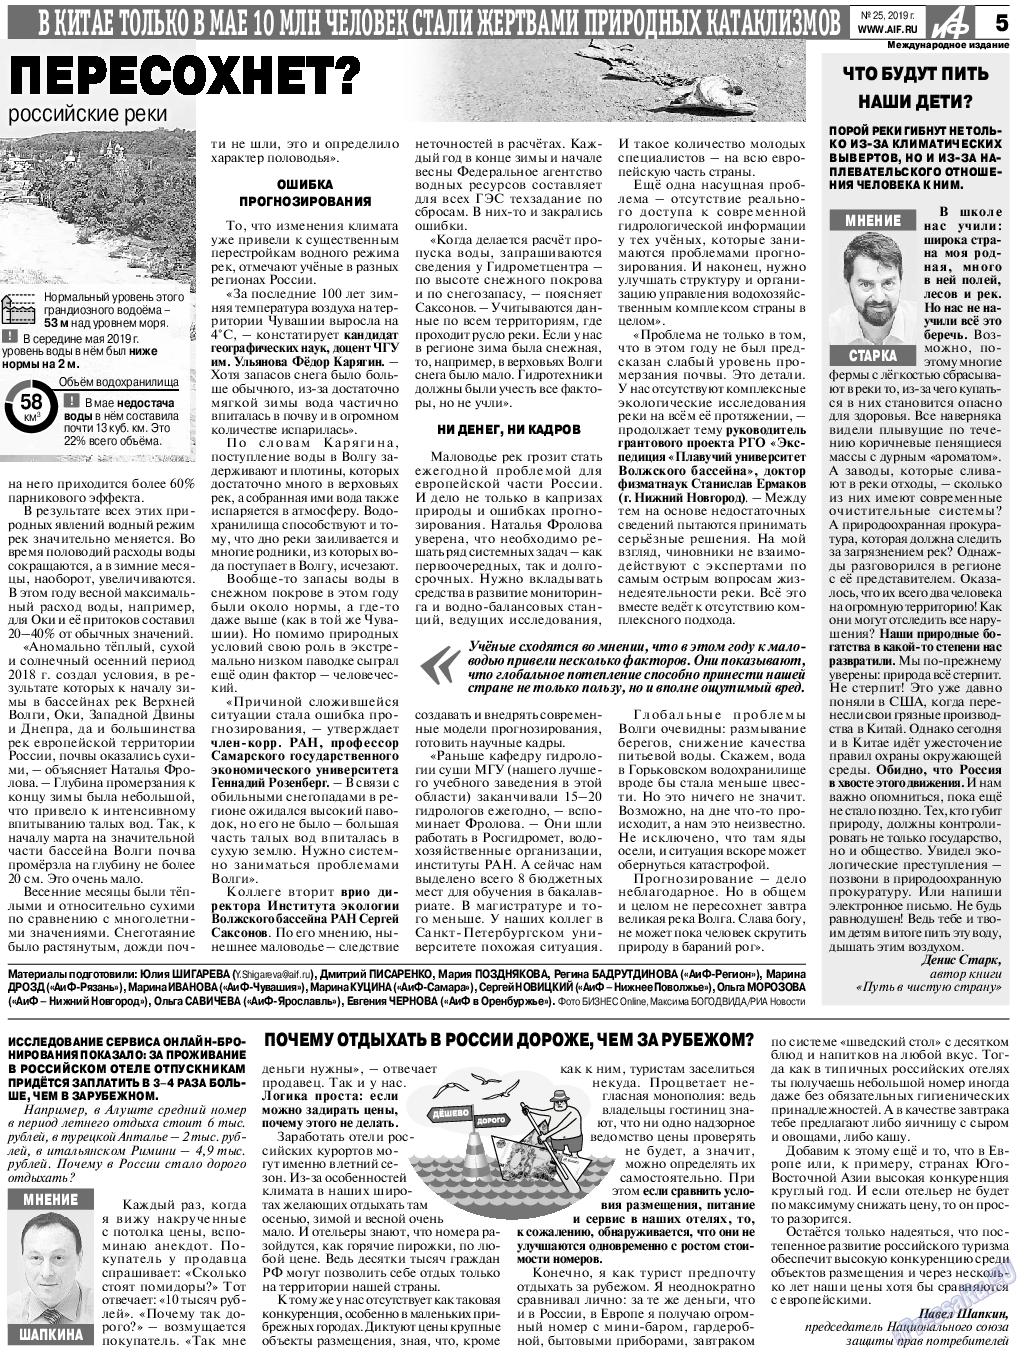 Аргументы и факты Европа (газета). 2019 год, номер 25, стр. 5